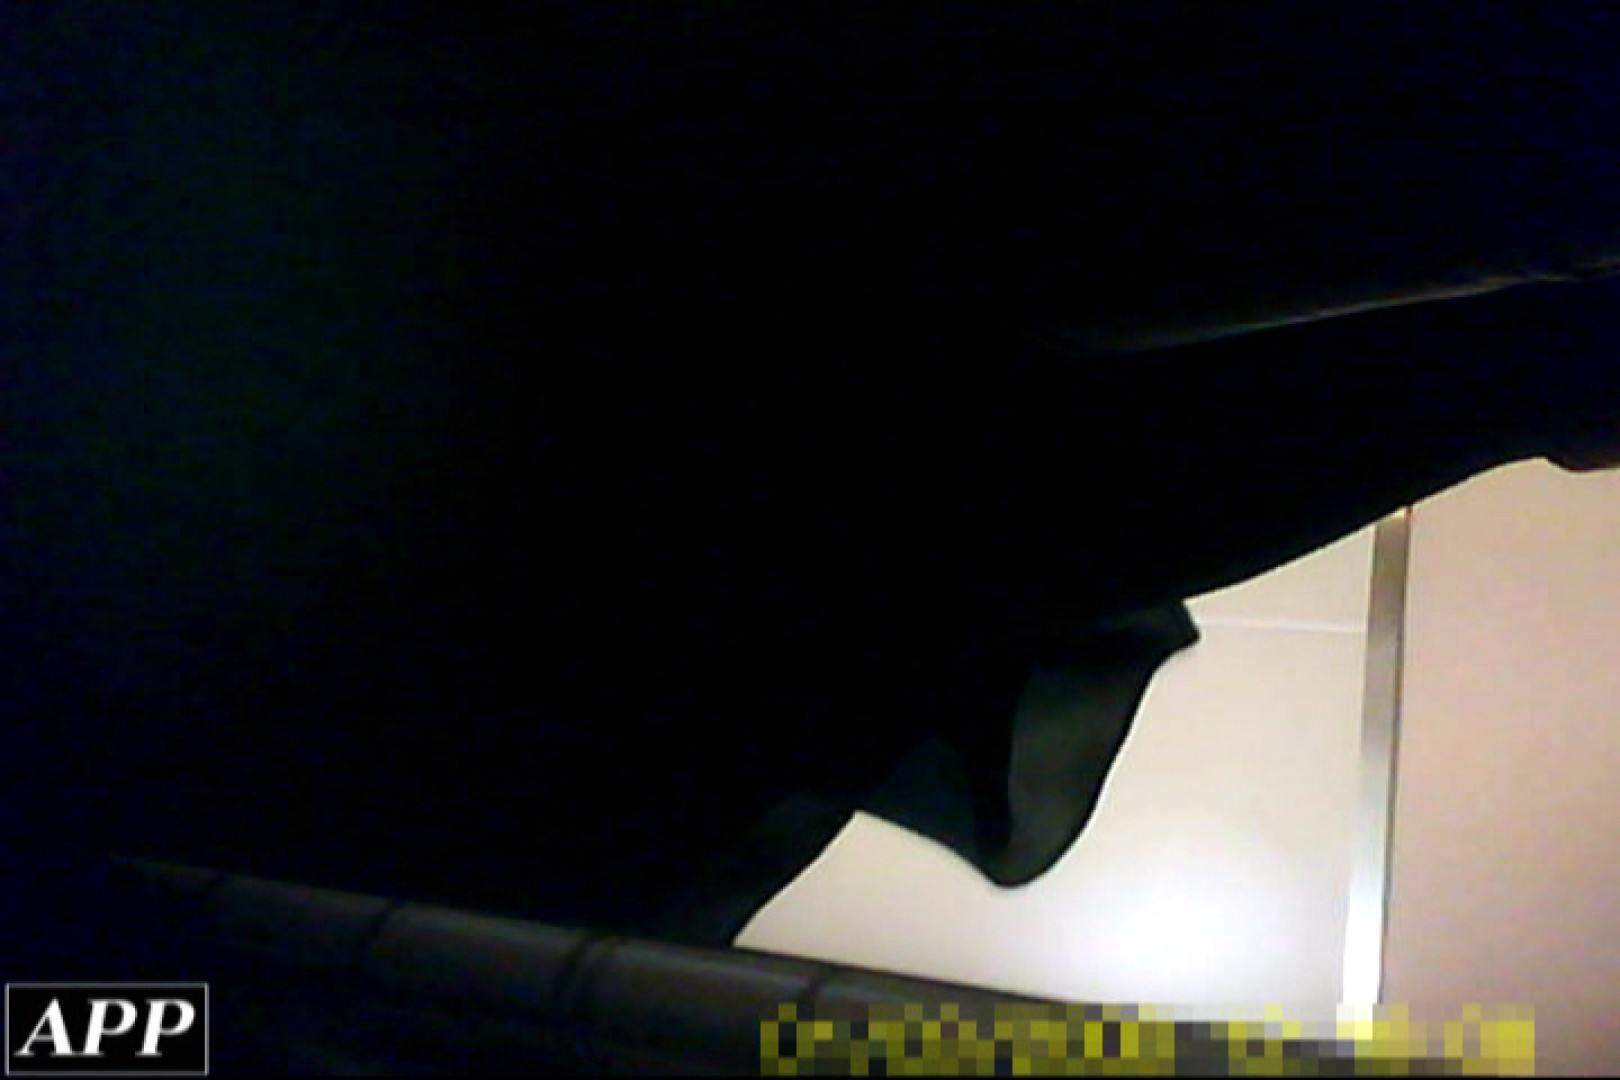 3視点洗面所 vol.106 OLエロ画像  112PICs 104